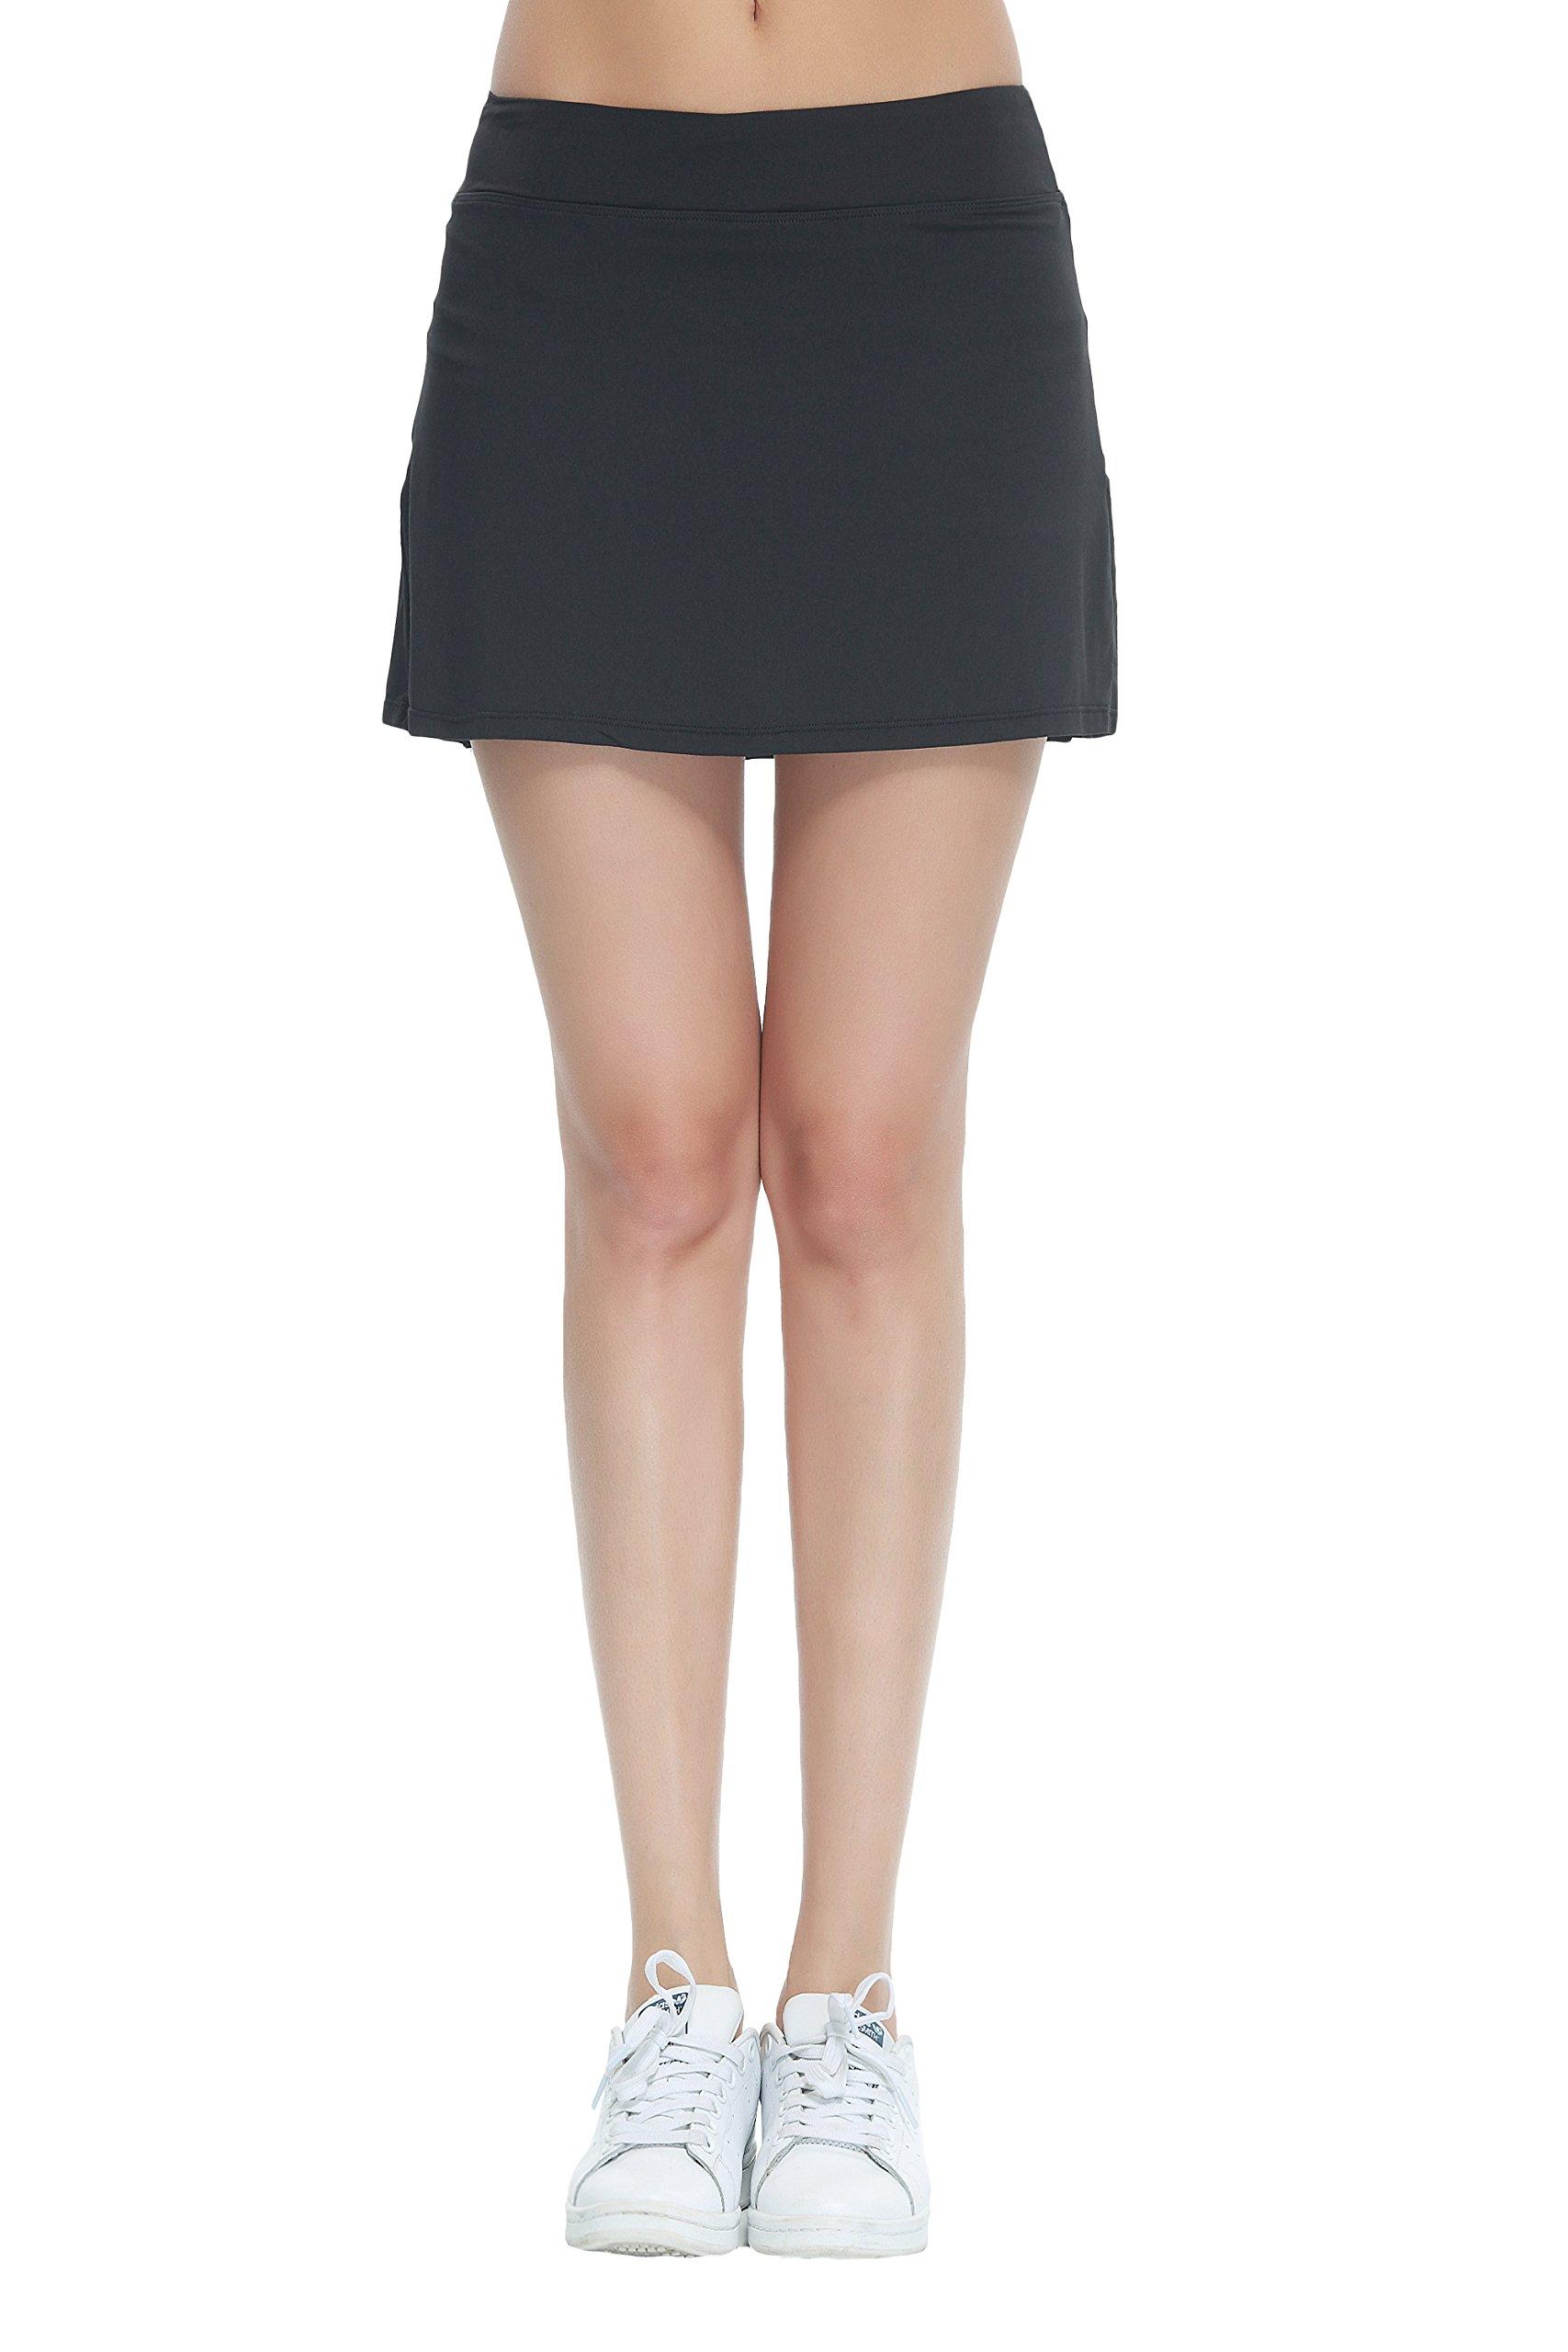 Honour Fashion Women's Golf Underneath Shorts Skorts (Black, Small)